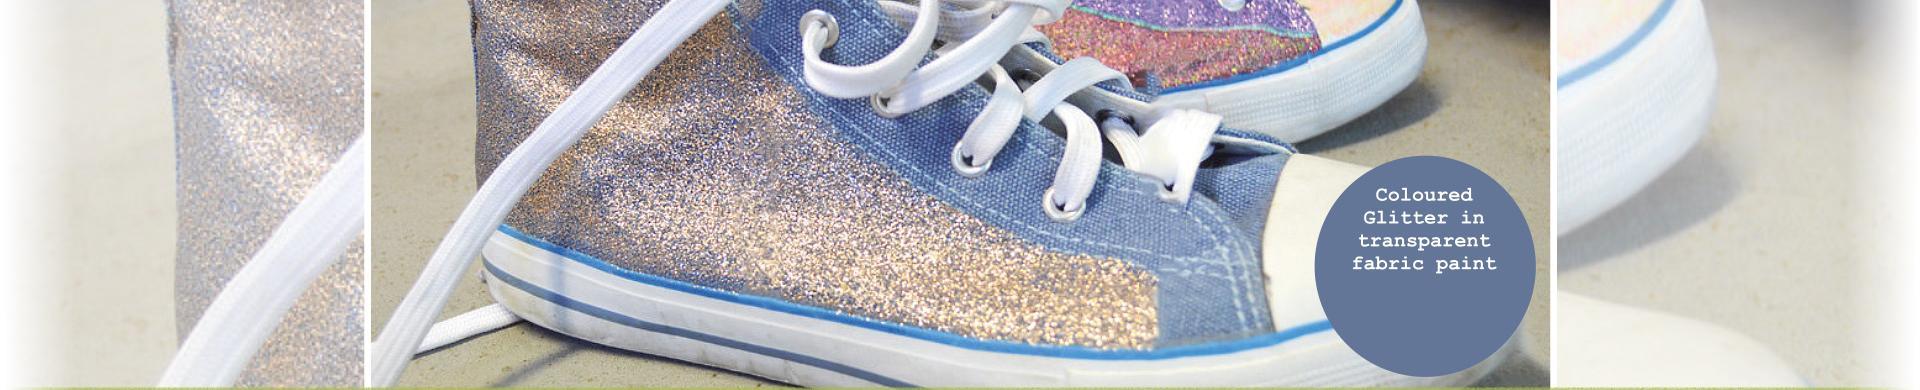 Fashion-Tex Glitter Fabric Paint